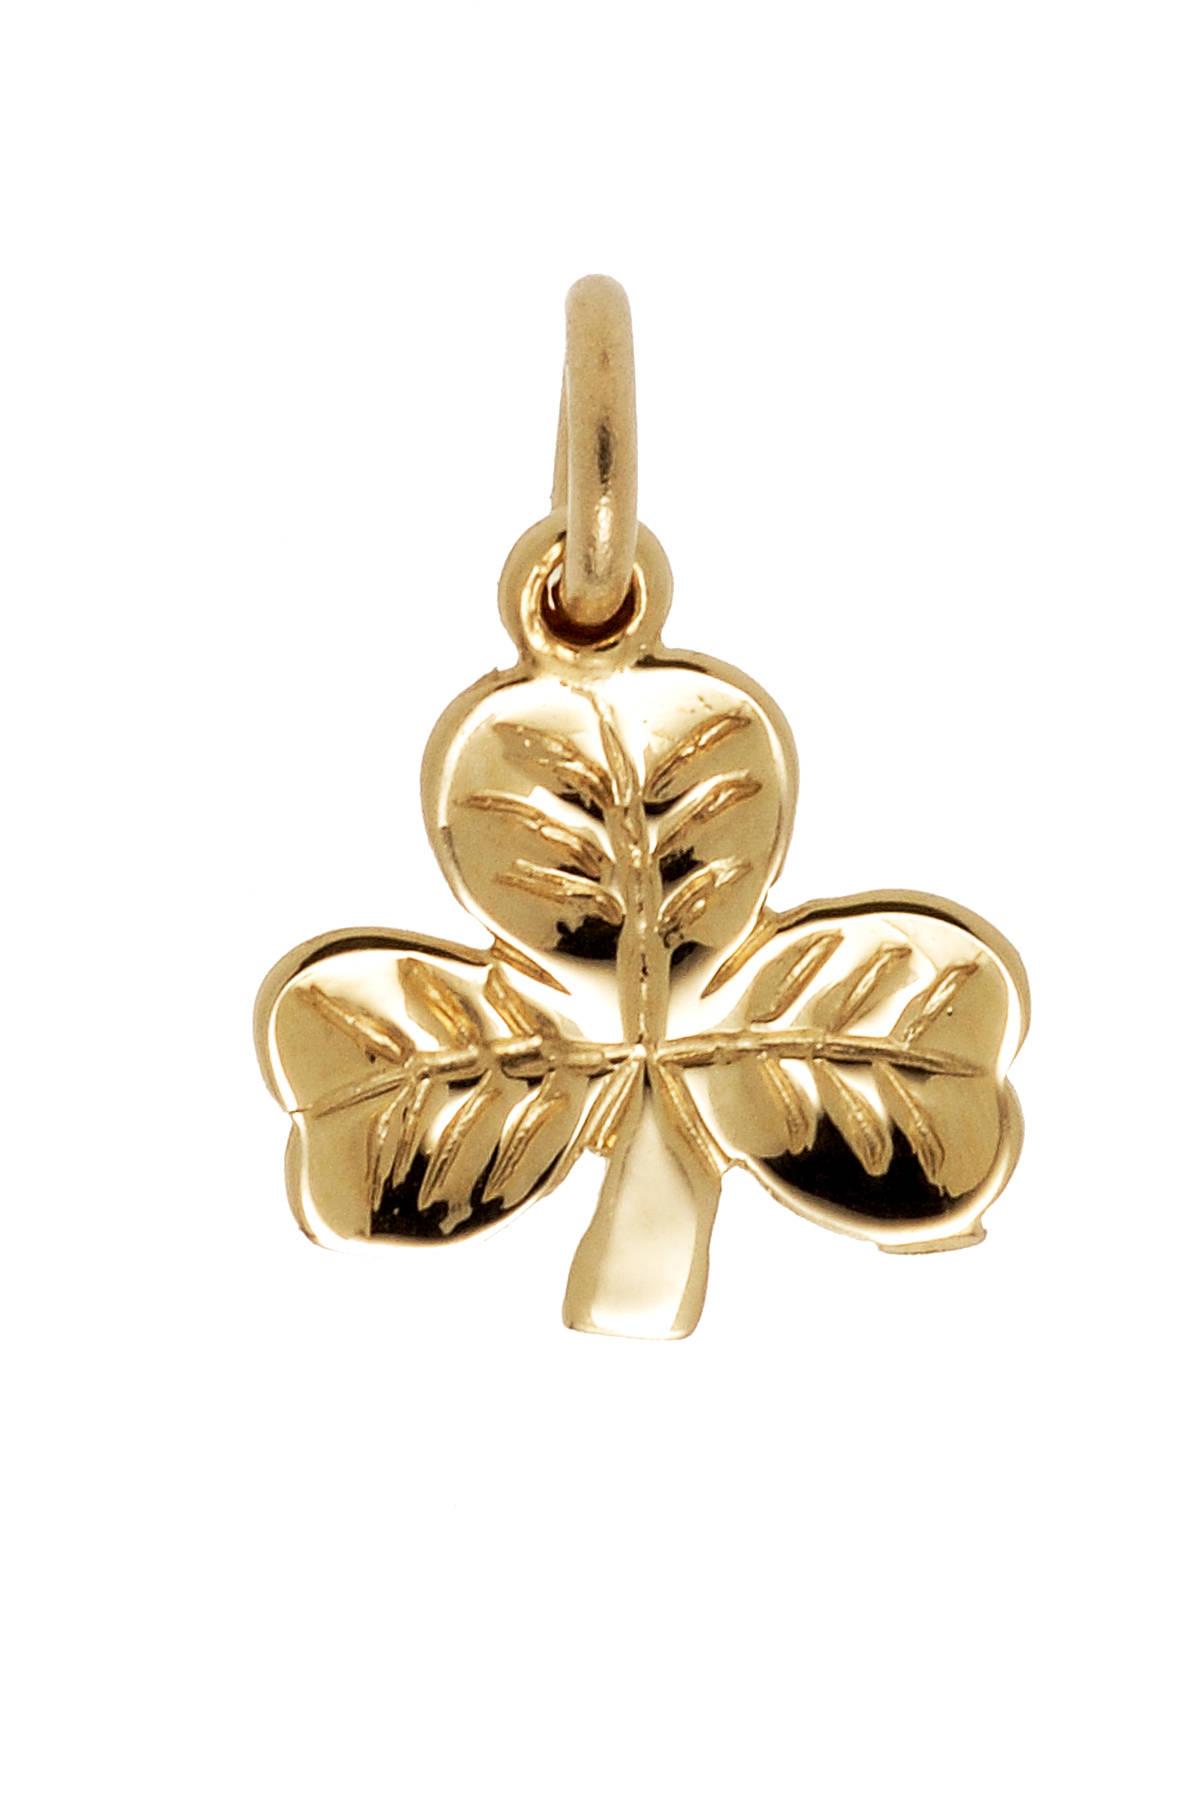 10 carat small shamrock charm,no chain